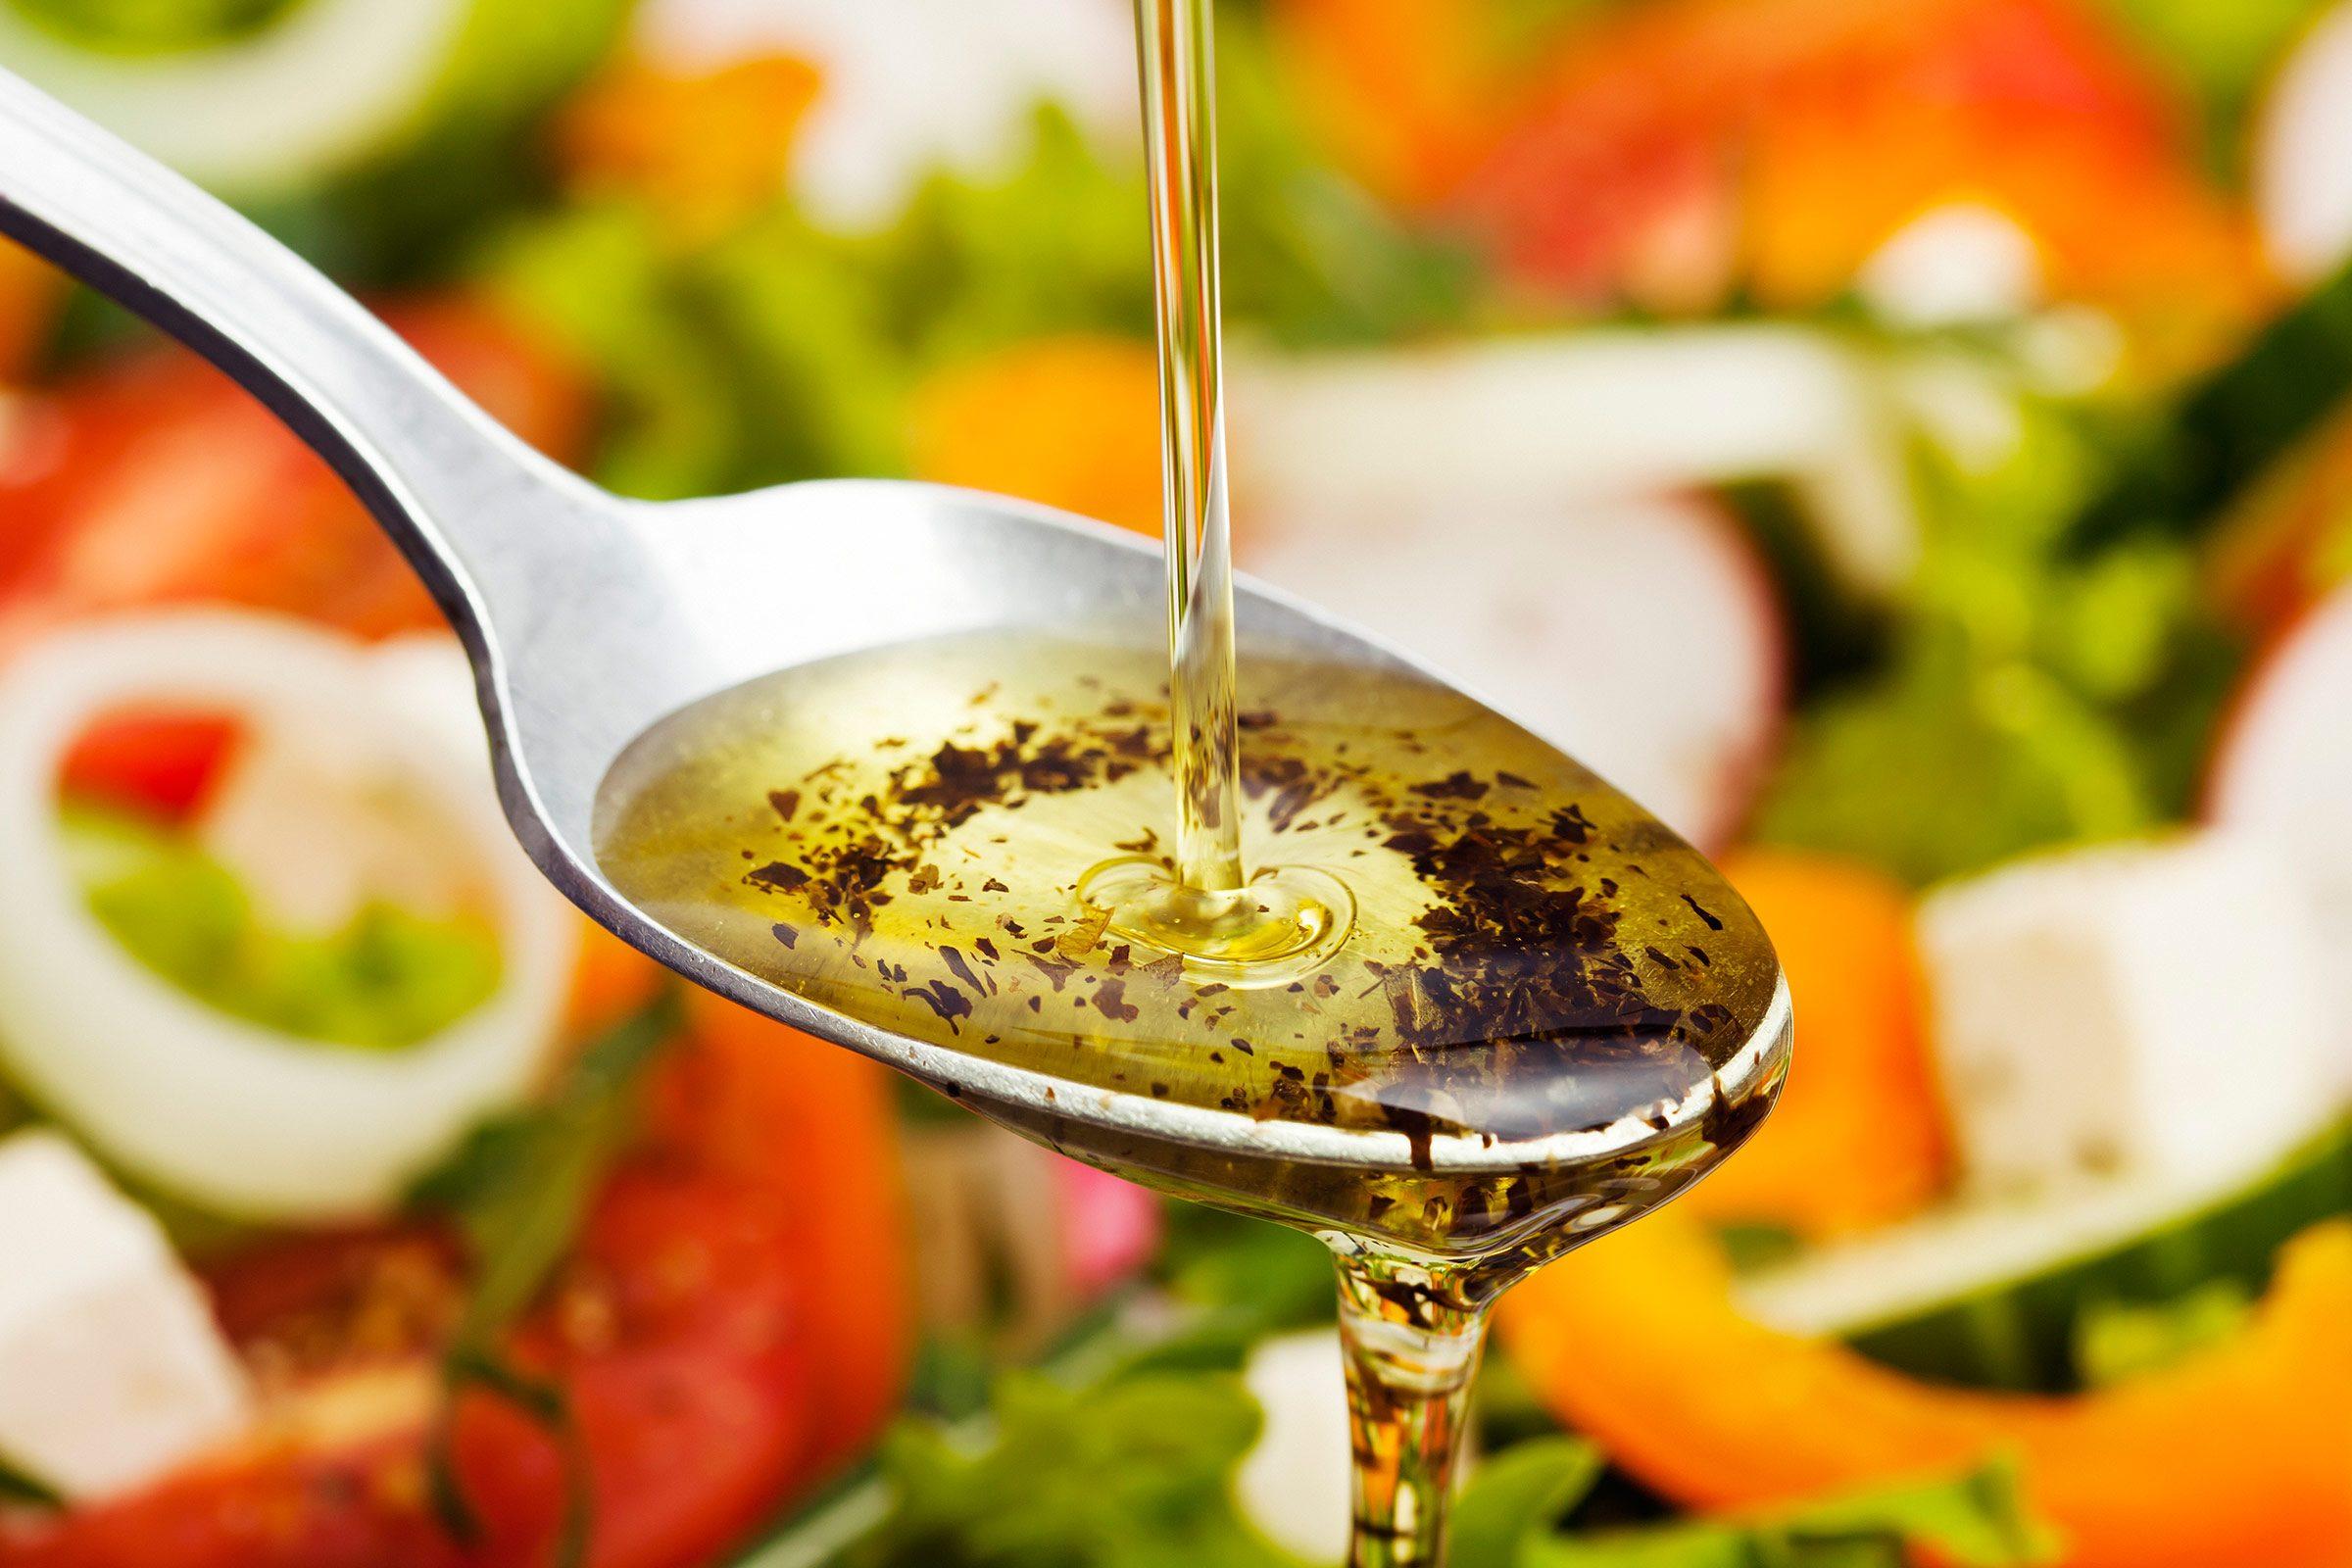 17. Bottled salad dressing or homemade?